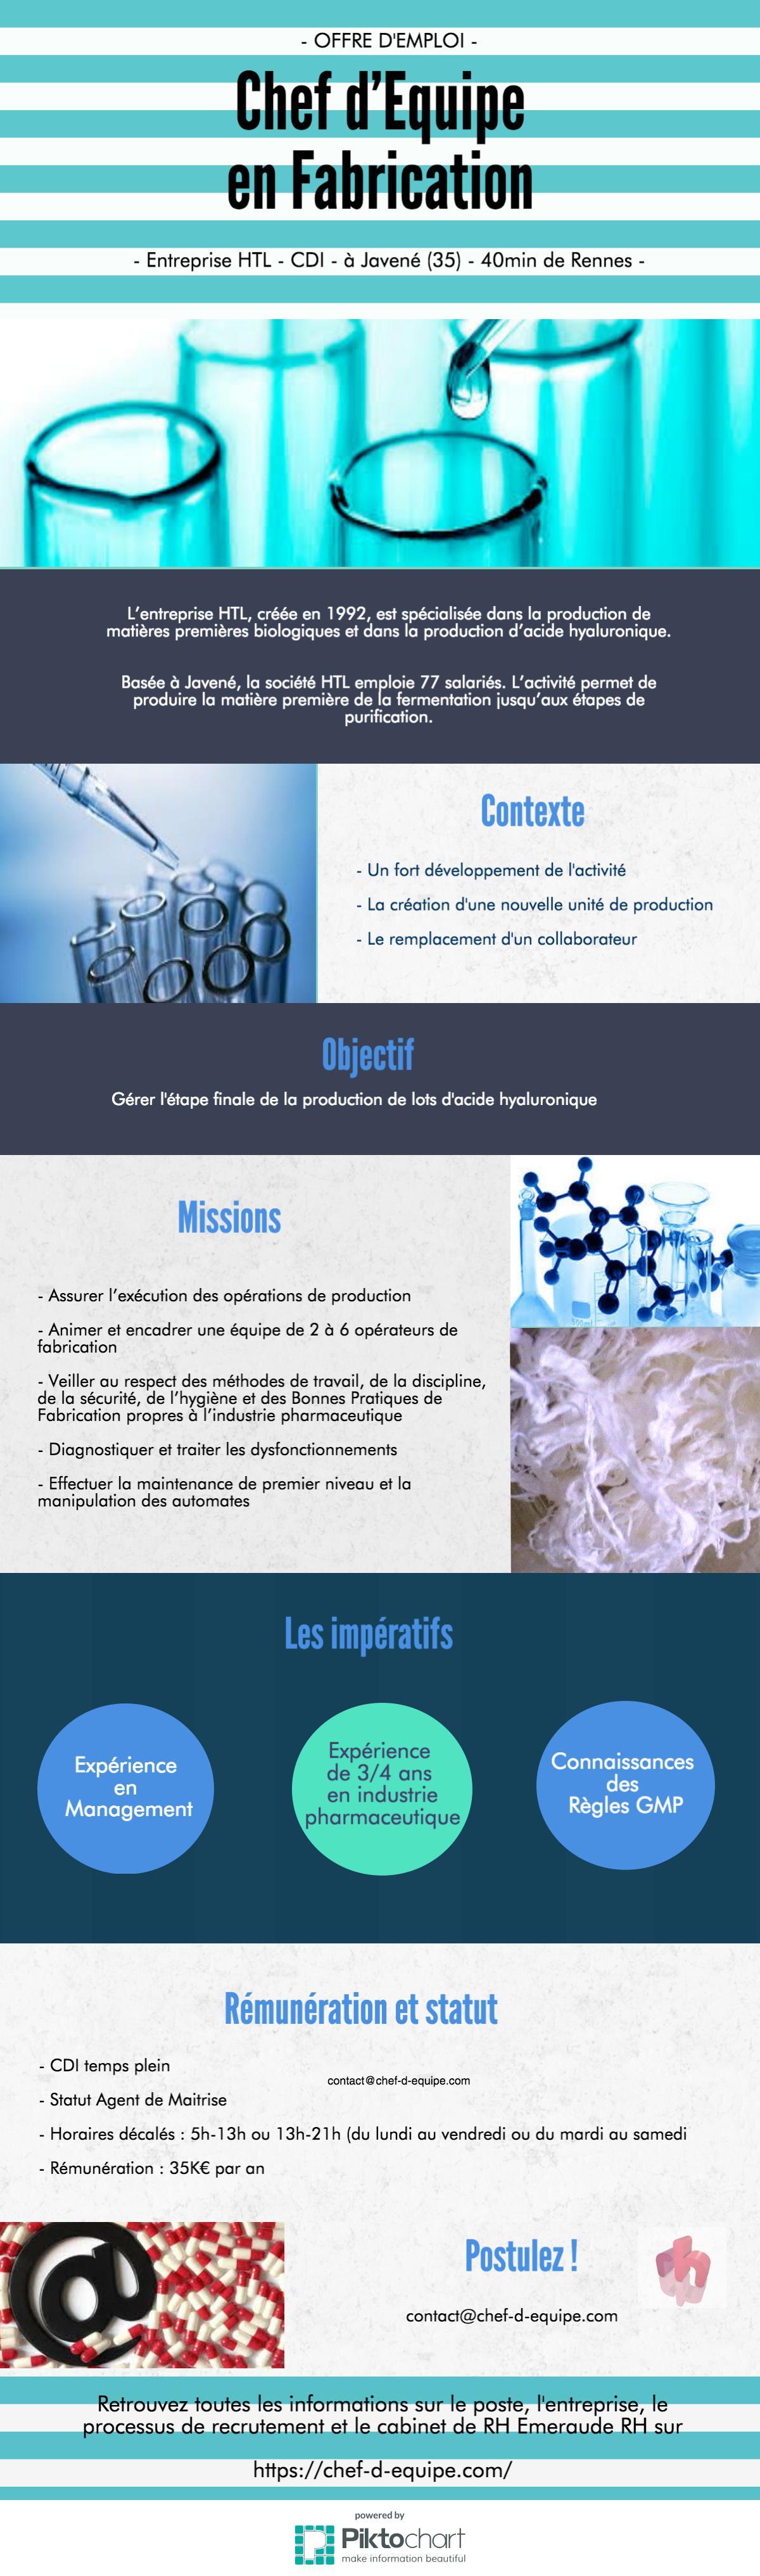 Emploi industrie pharmaceutique responsable production cdi cabinet recrutement rennes 35 - Cabinet recrutement rennes ...